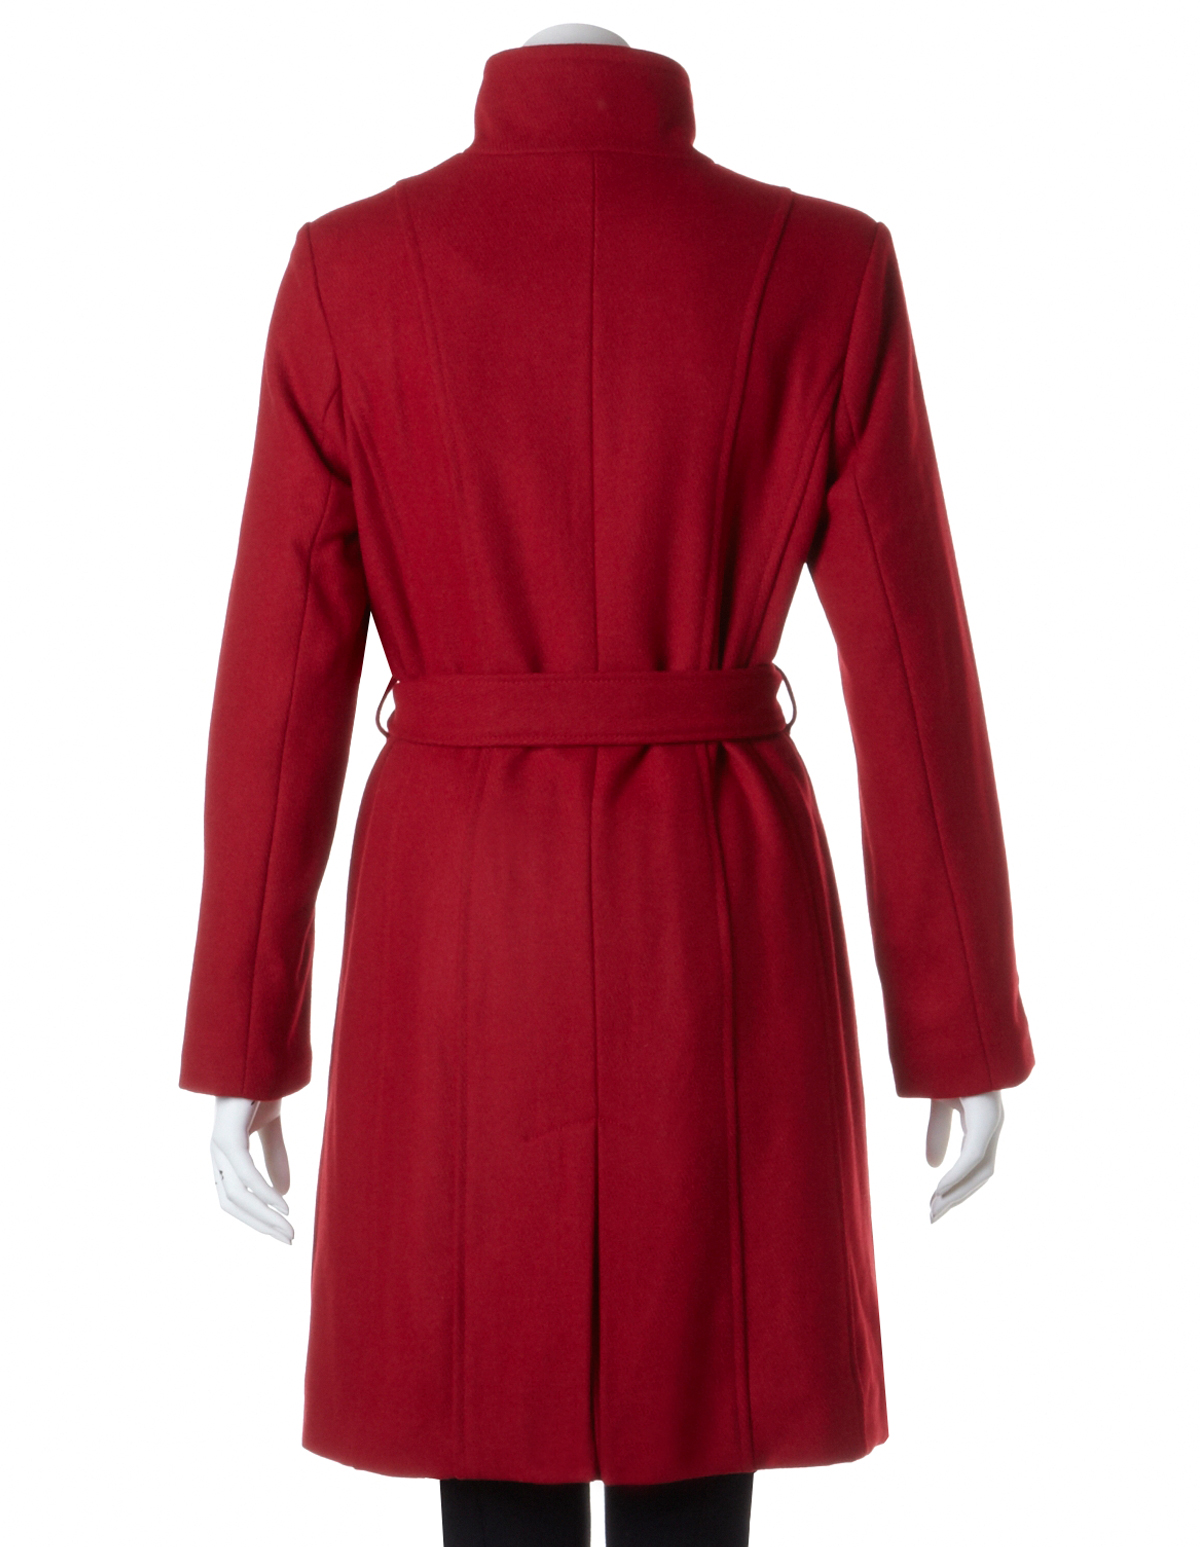 Mellie s women ariana belted shawl collar wool wrap coat wool blend belted wrap coat lauren ralph wool belted wrap coat plus size wool coat Wool Blend Belted Wrap Coat Per Una M SBurberry Wool Belted Wrap Coat Where To How WearBlack L Belted Wool Wrap Coat Rosegal Shawl Belted Wool Blend Wrap Coat In [ ].